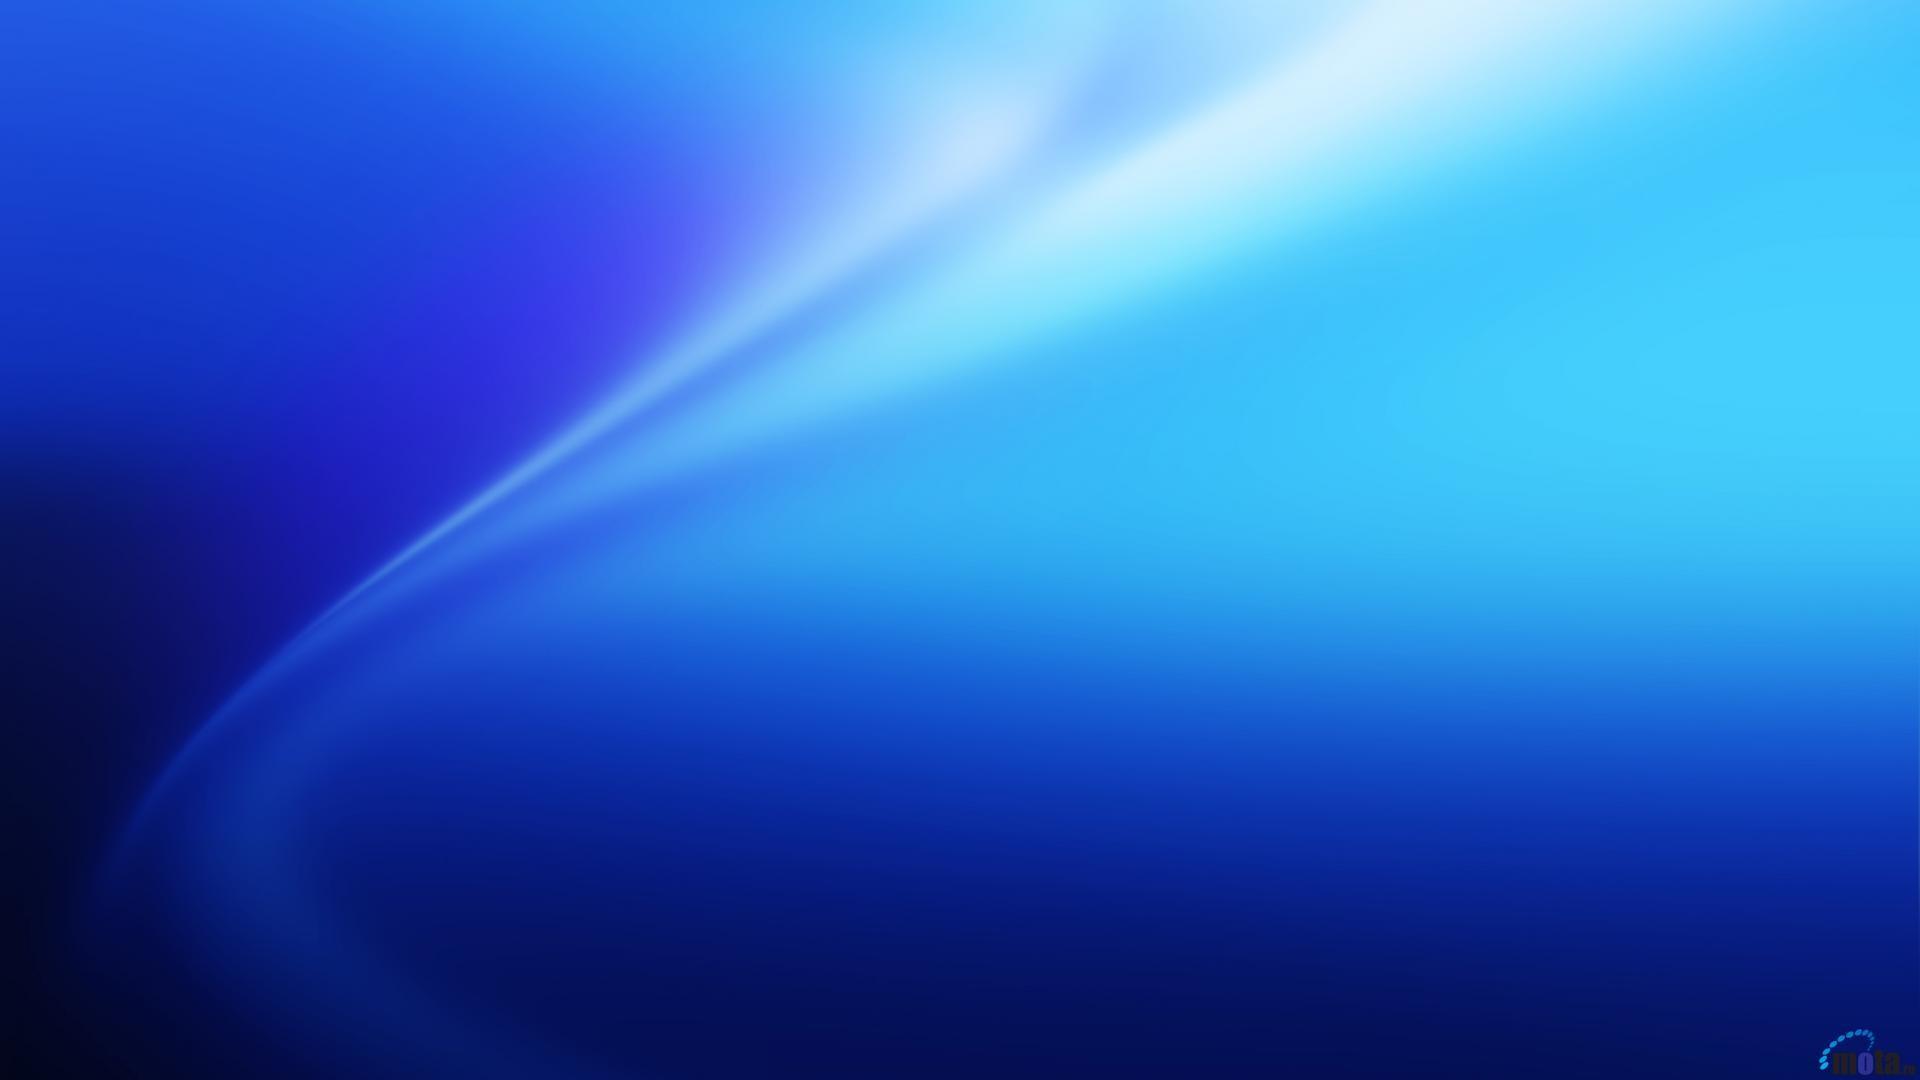 1920x1200 HD Desktop Blue Wallpapers | HD Wallpapers